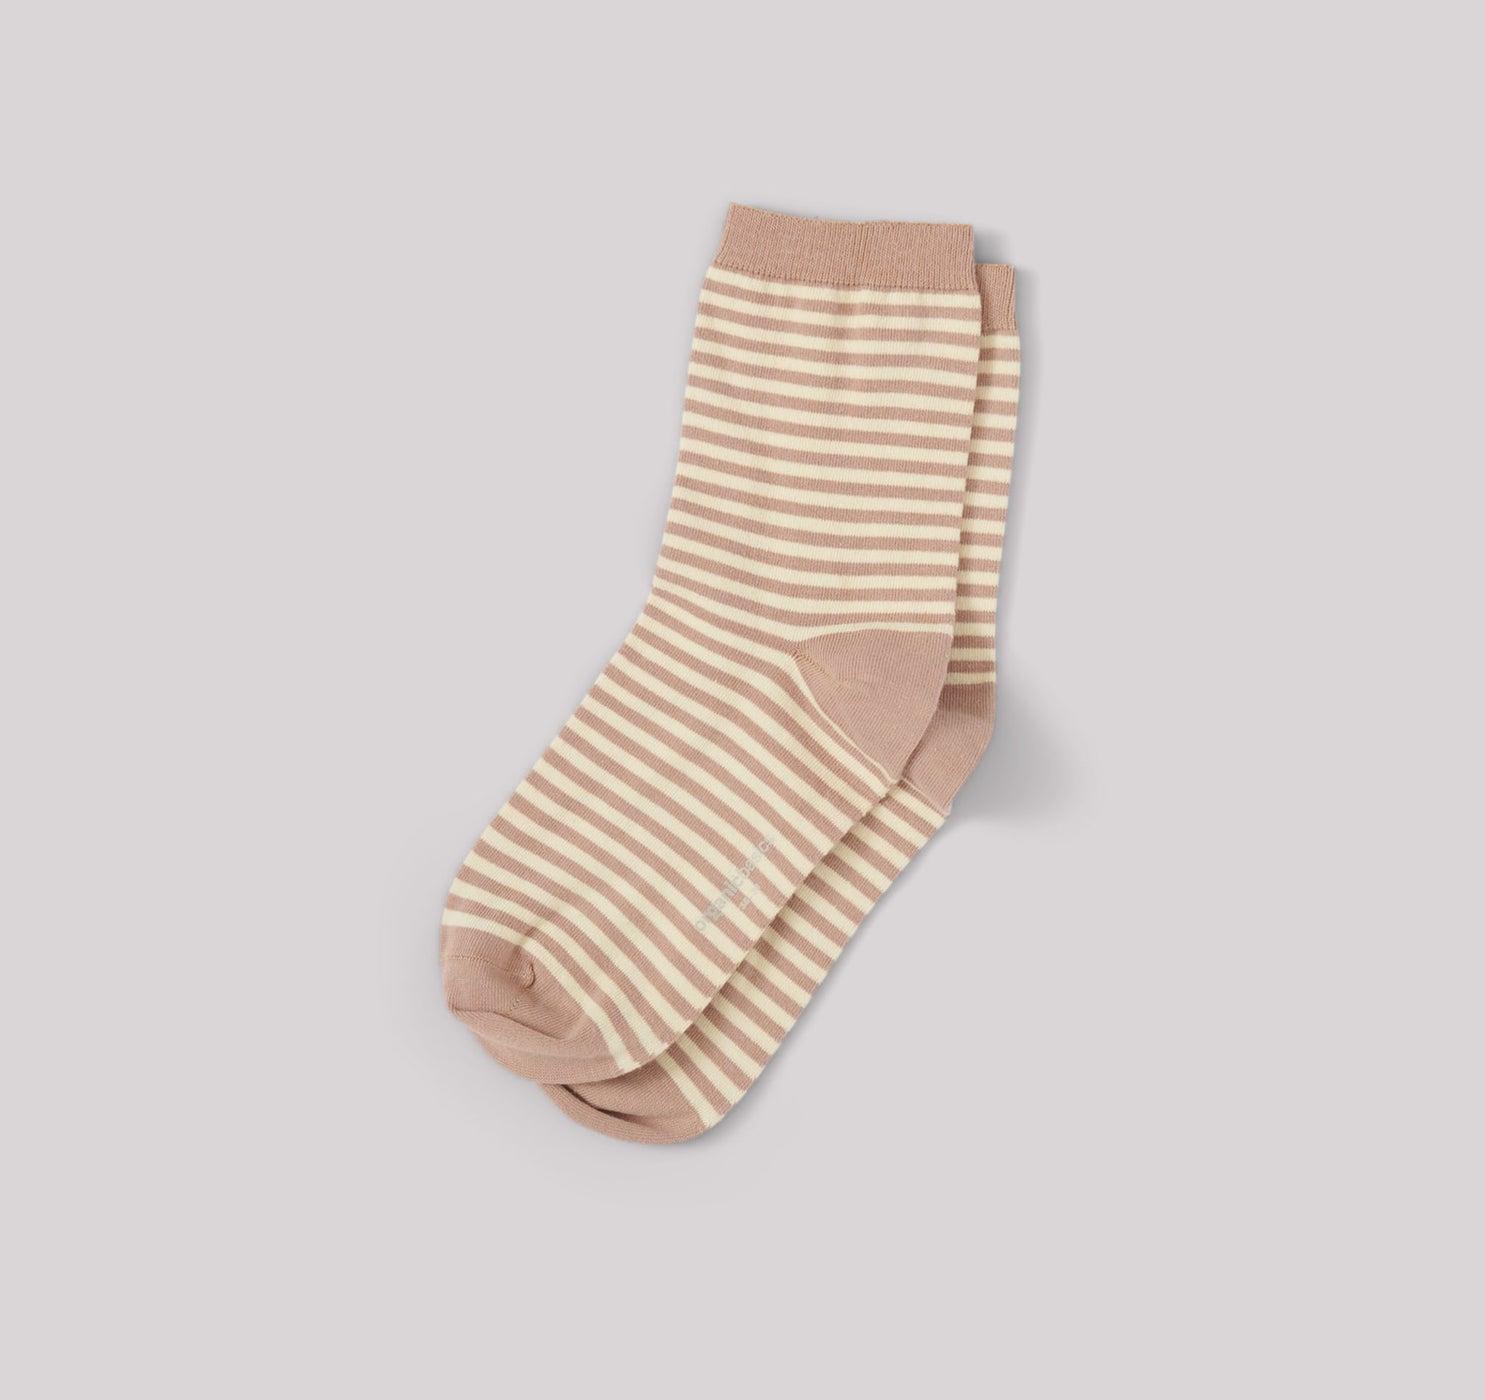 Organic Basics Organic Cotton Color Striped Socks